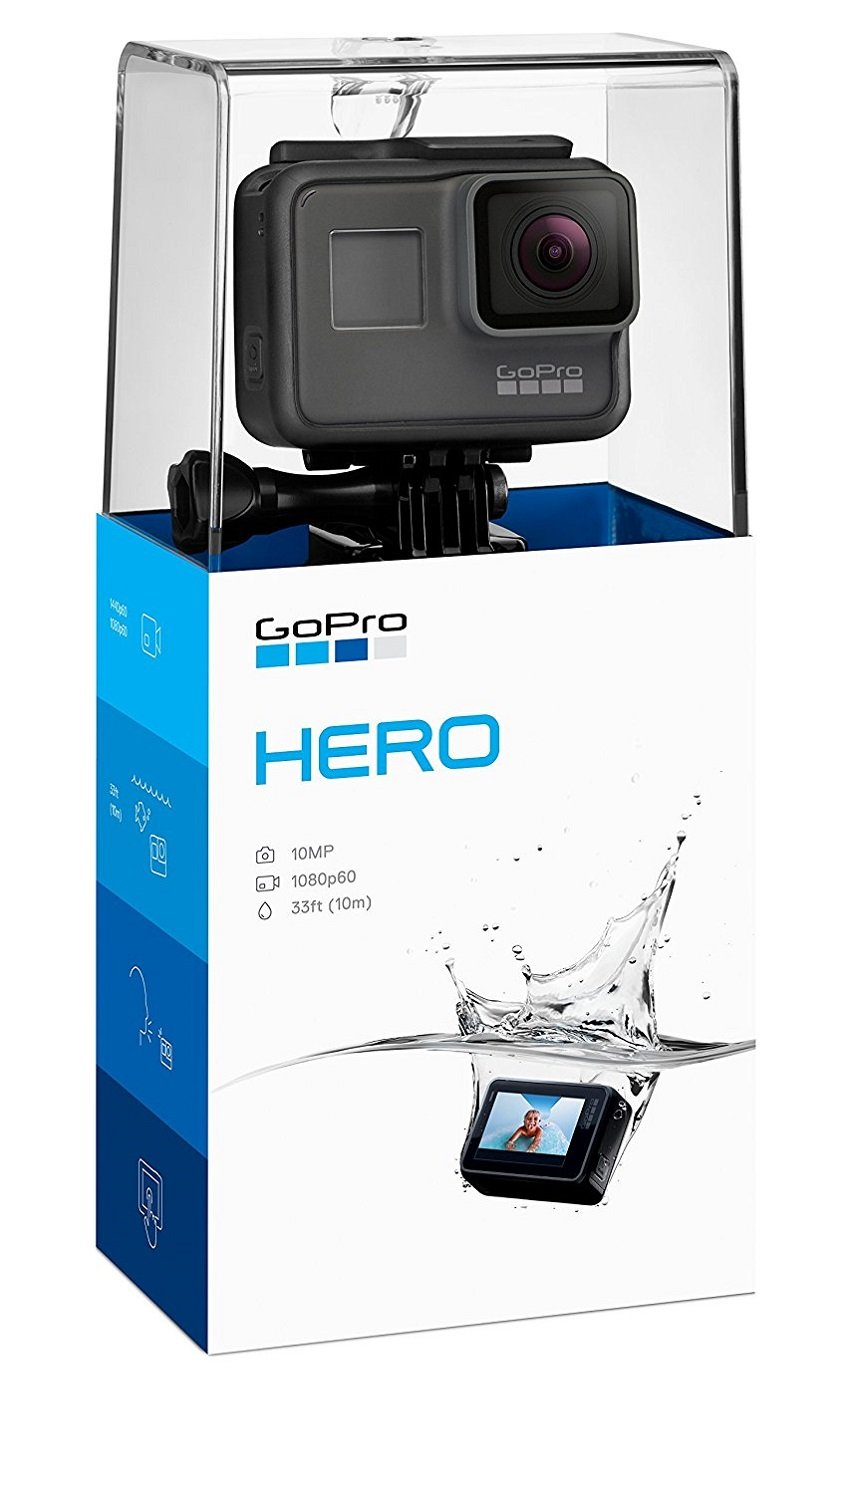 GoPro Hero (Caméra sport)